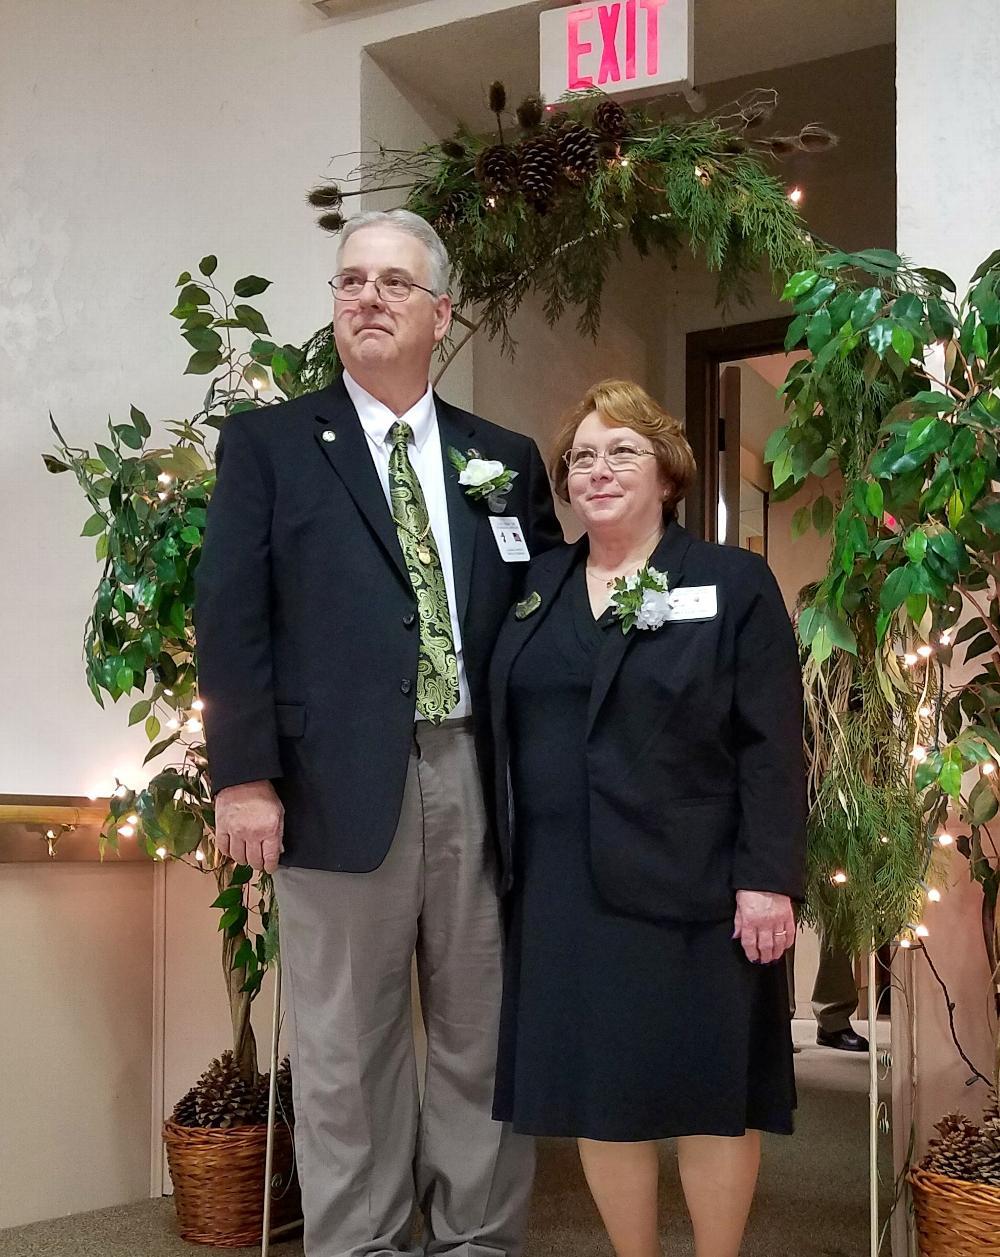 Leading Knight Randi Kobernick and wife Trustee Doris Kobernick